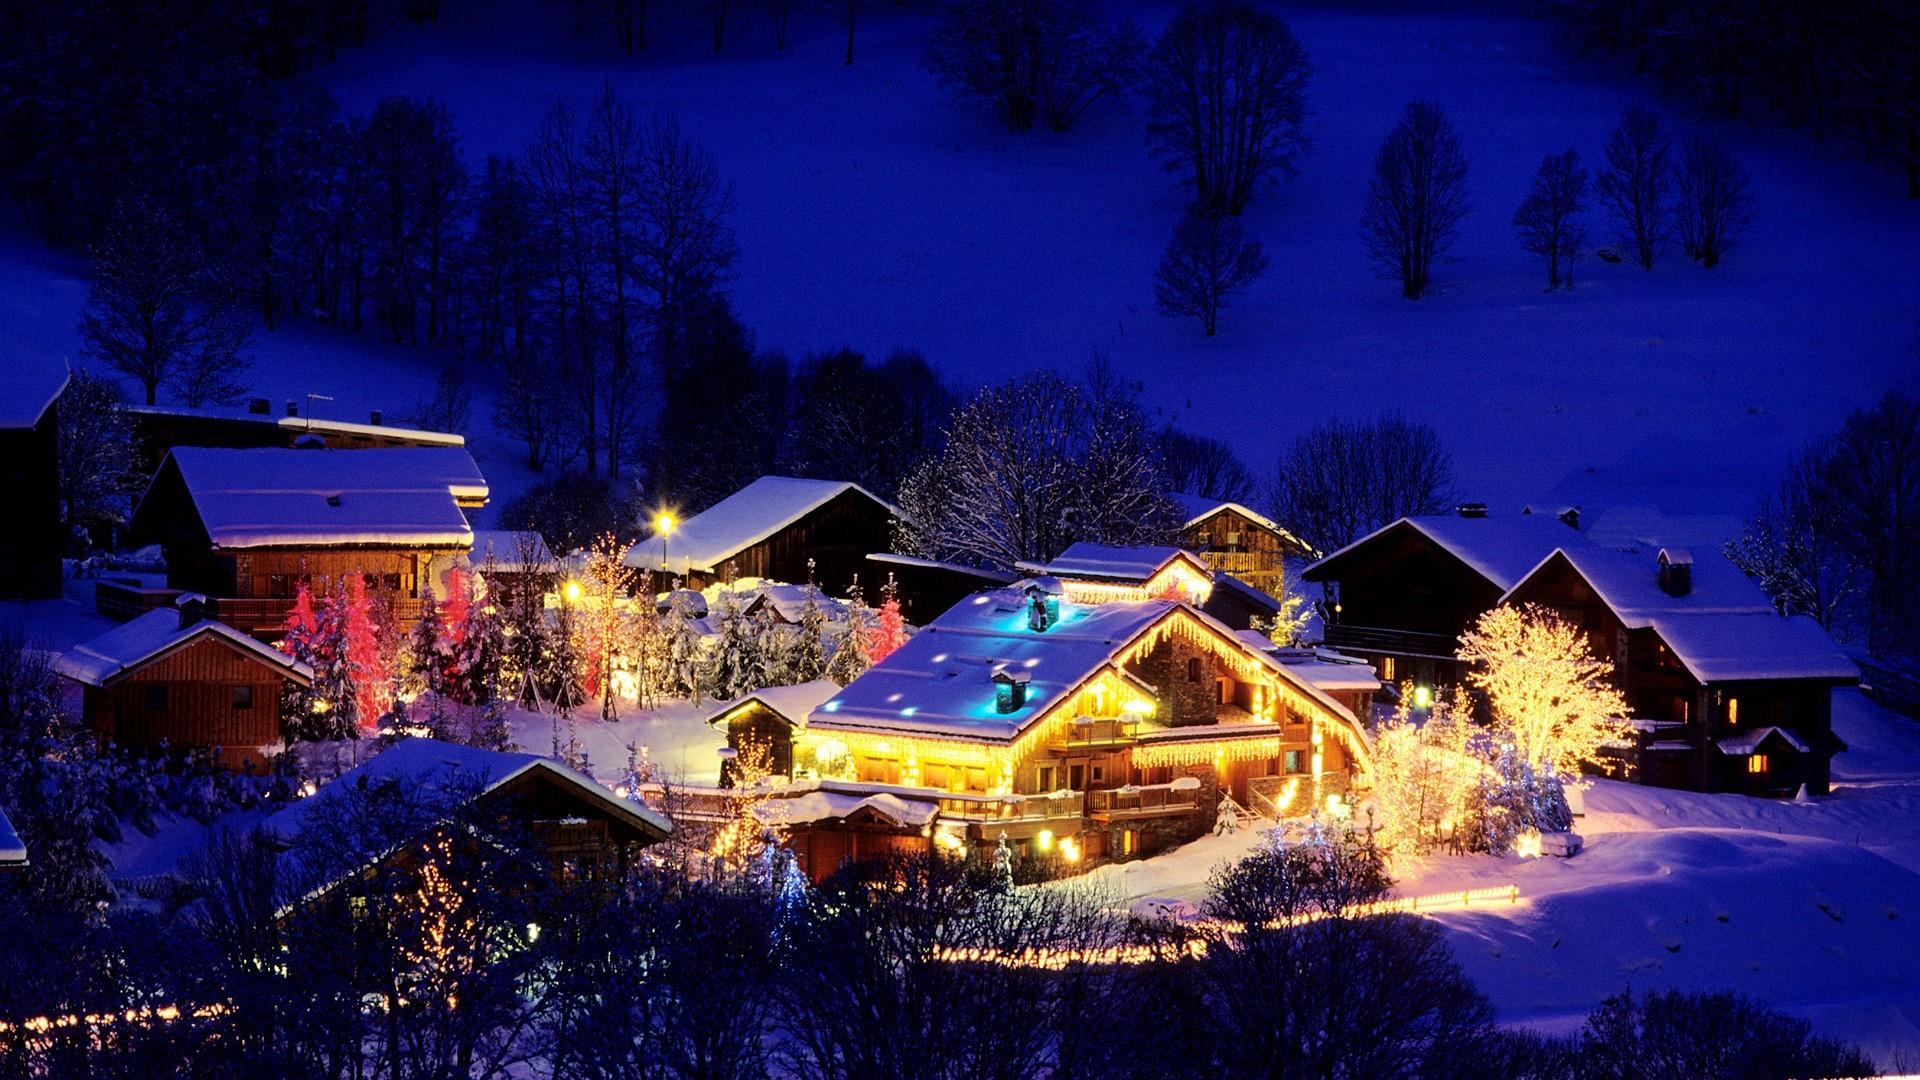 France Christmas Wallpaper France, Christmas, Ski, Resort